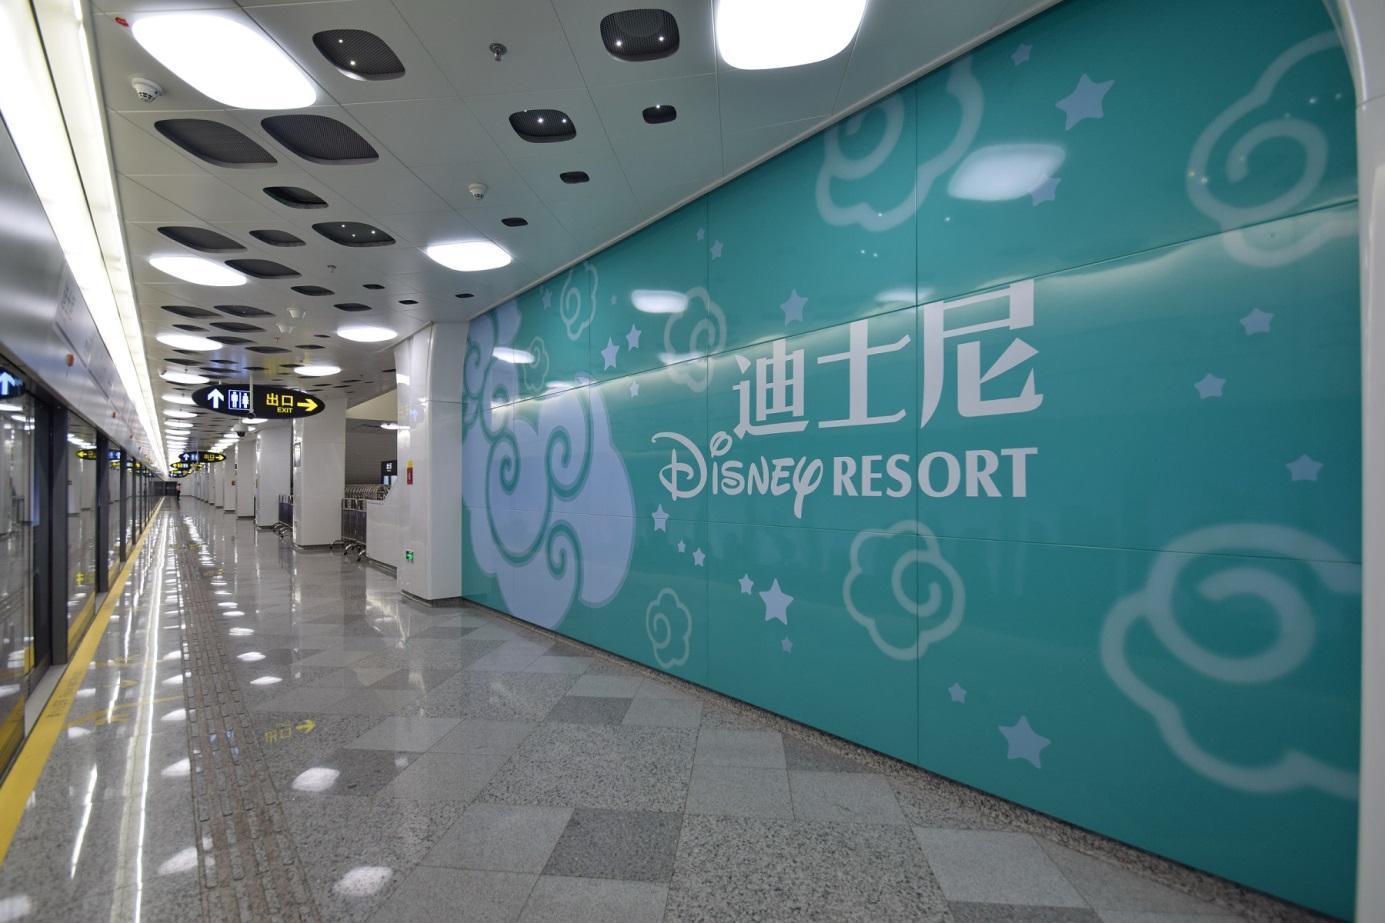 https://upload.wikimedia.org/wikipedia/commons/4/41/Disney_Resort_Station_Line_11_Platform_2.jpg